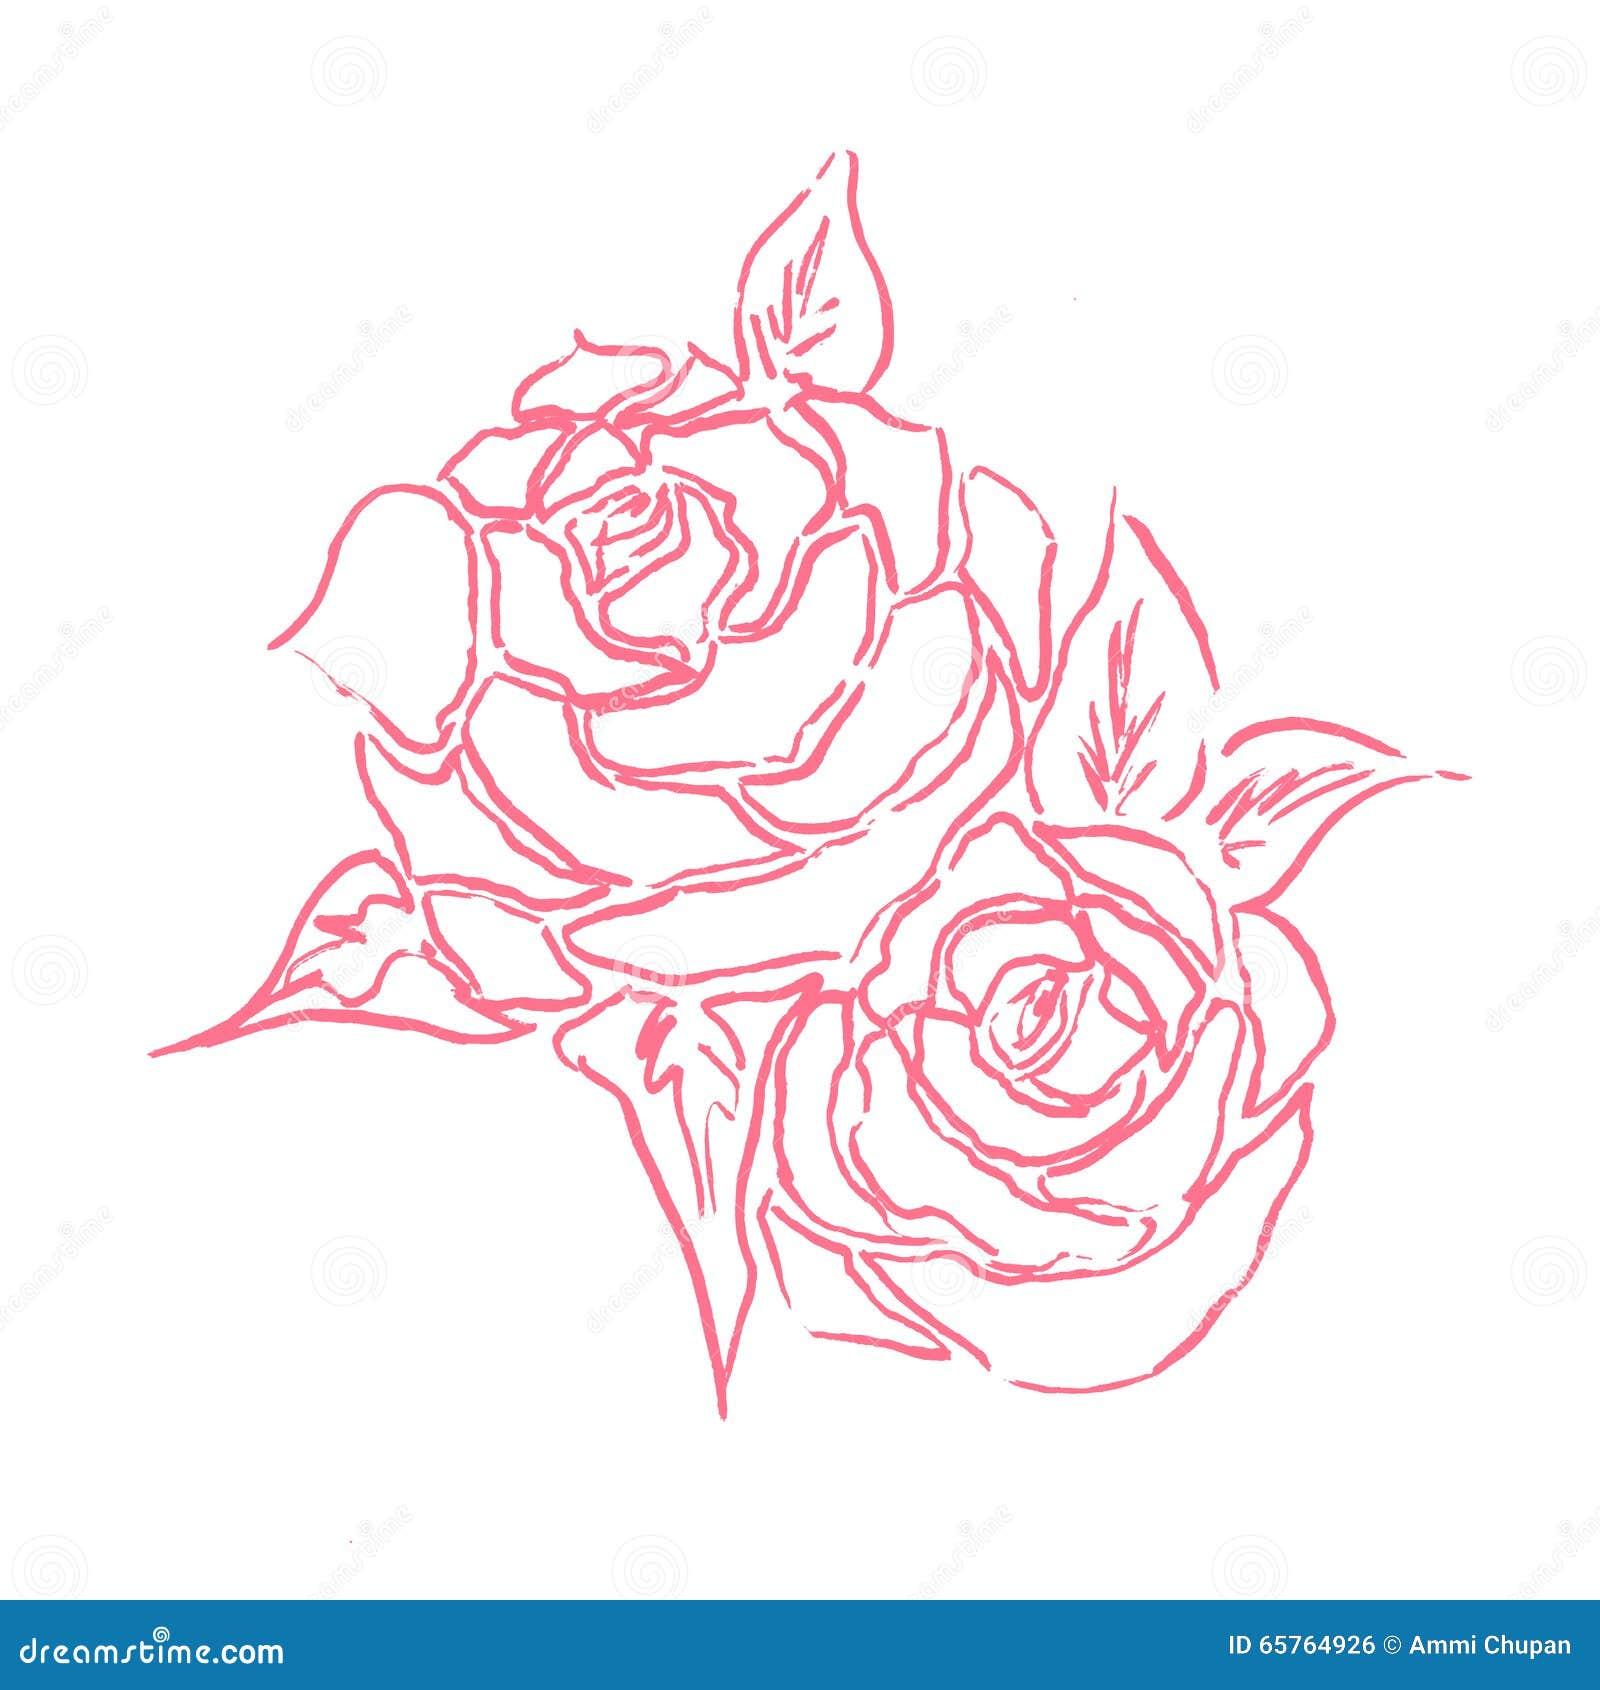 Roses wedding card theme stock photo - Dessin de rose rouge ...